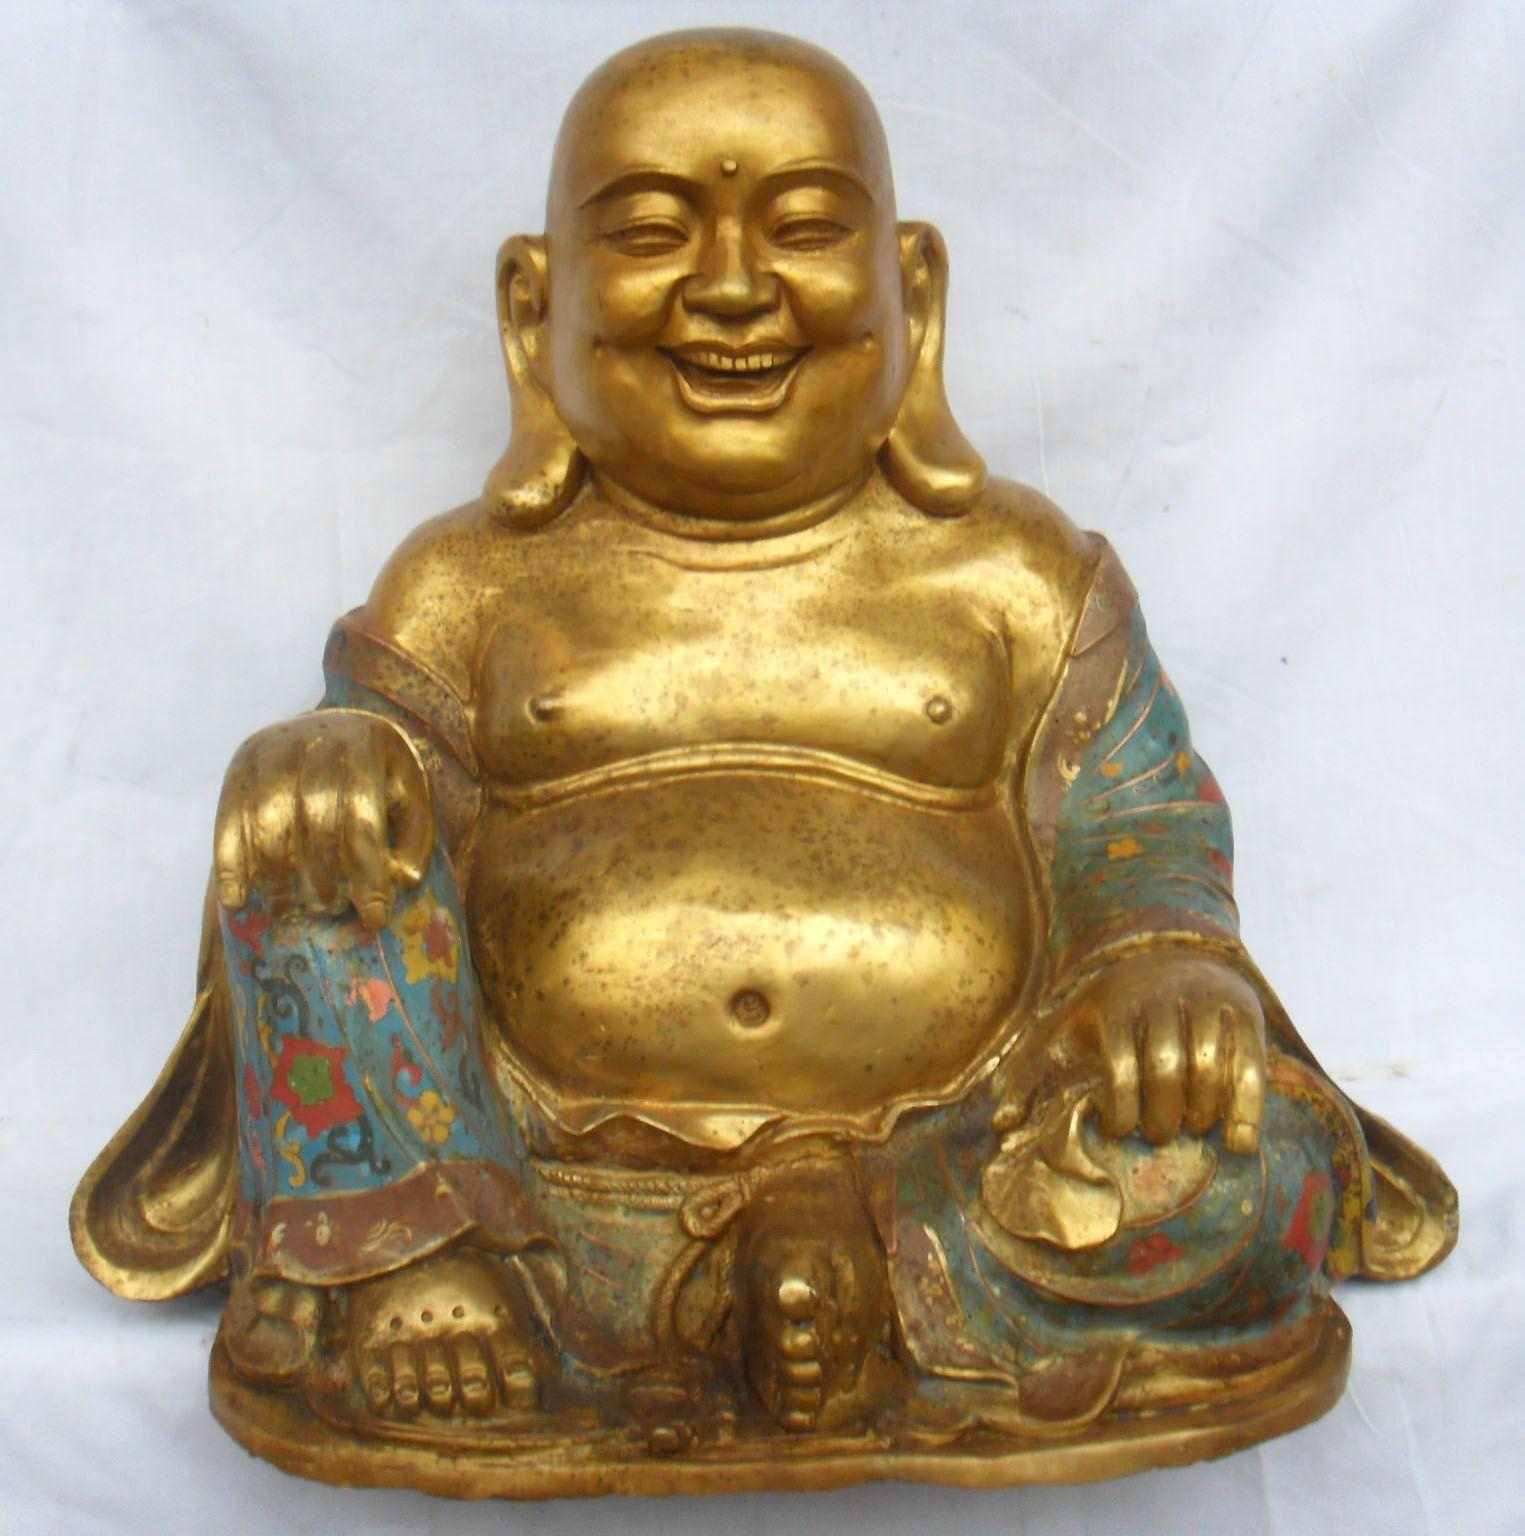 Buda estaba gordo...? Adelantando el Mundo http://go.shr.lc/2czG2fs ...